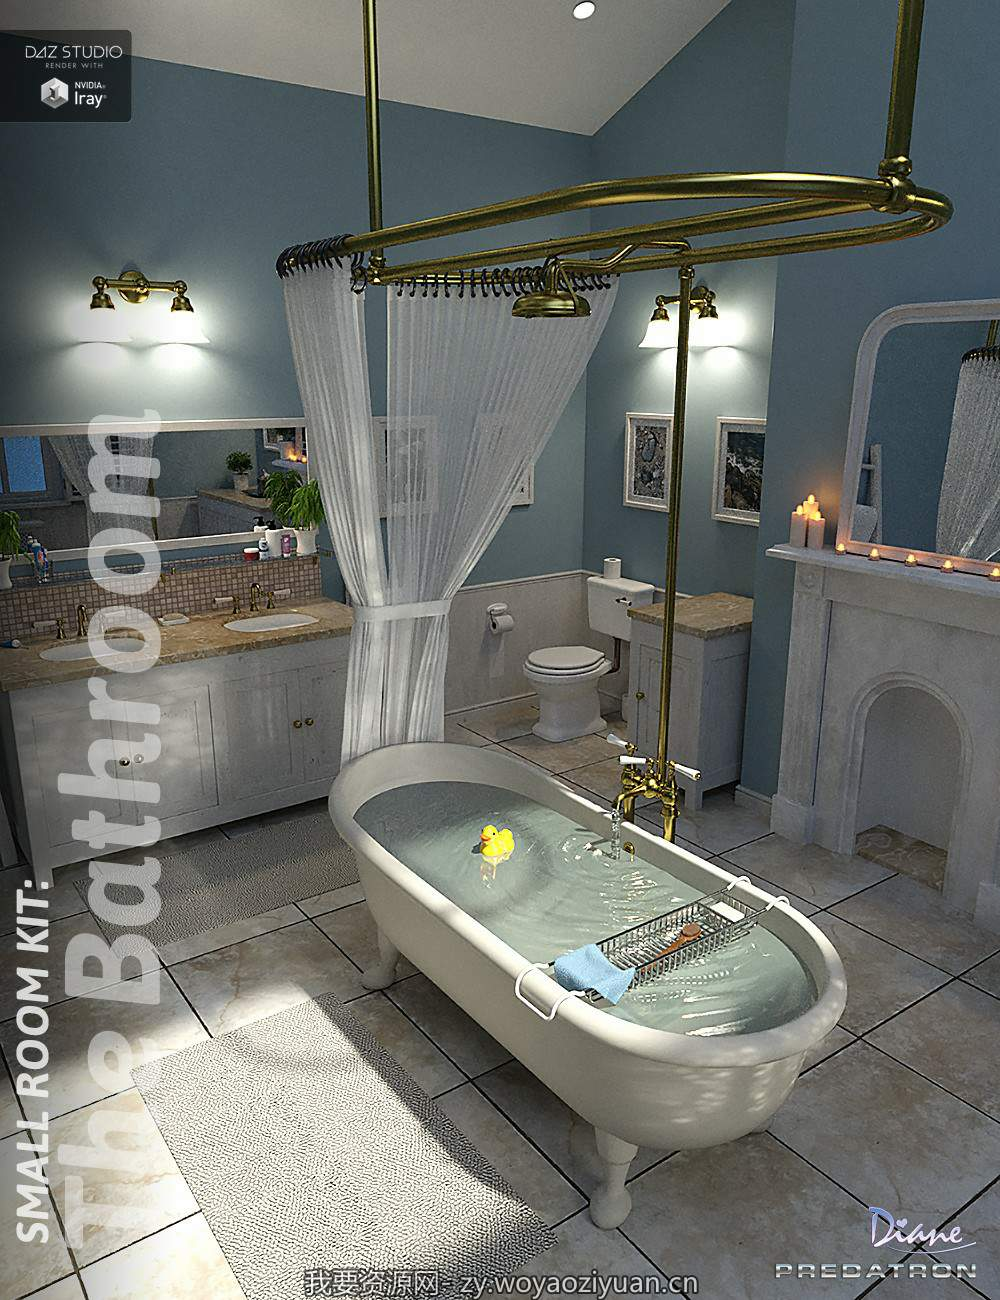 Small Room Kit Bathroom Props